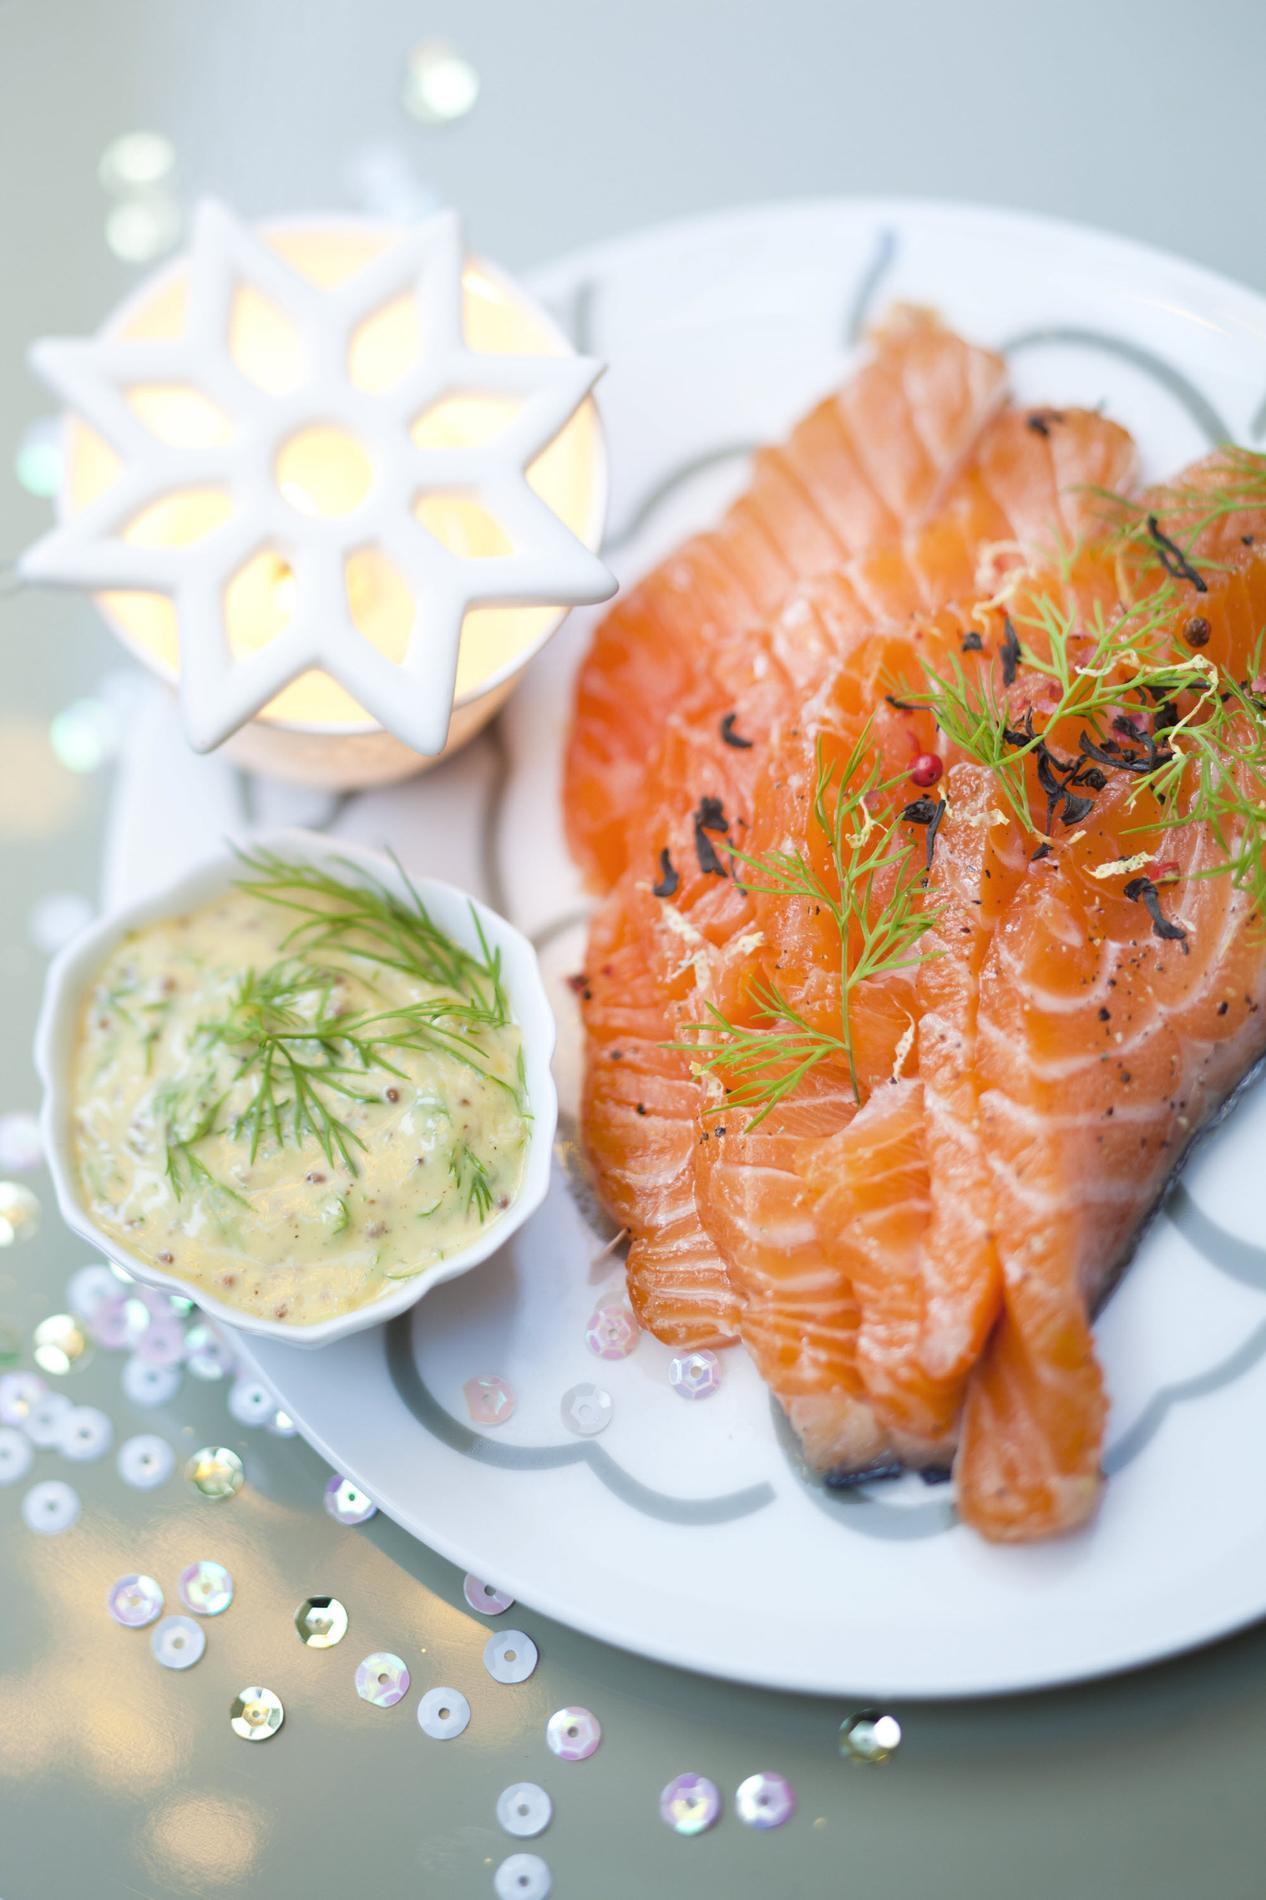 recette saumon gravlax au th fum cuisine madame figaro. Black Bedroom Furniture Sets. Home Design Ideas